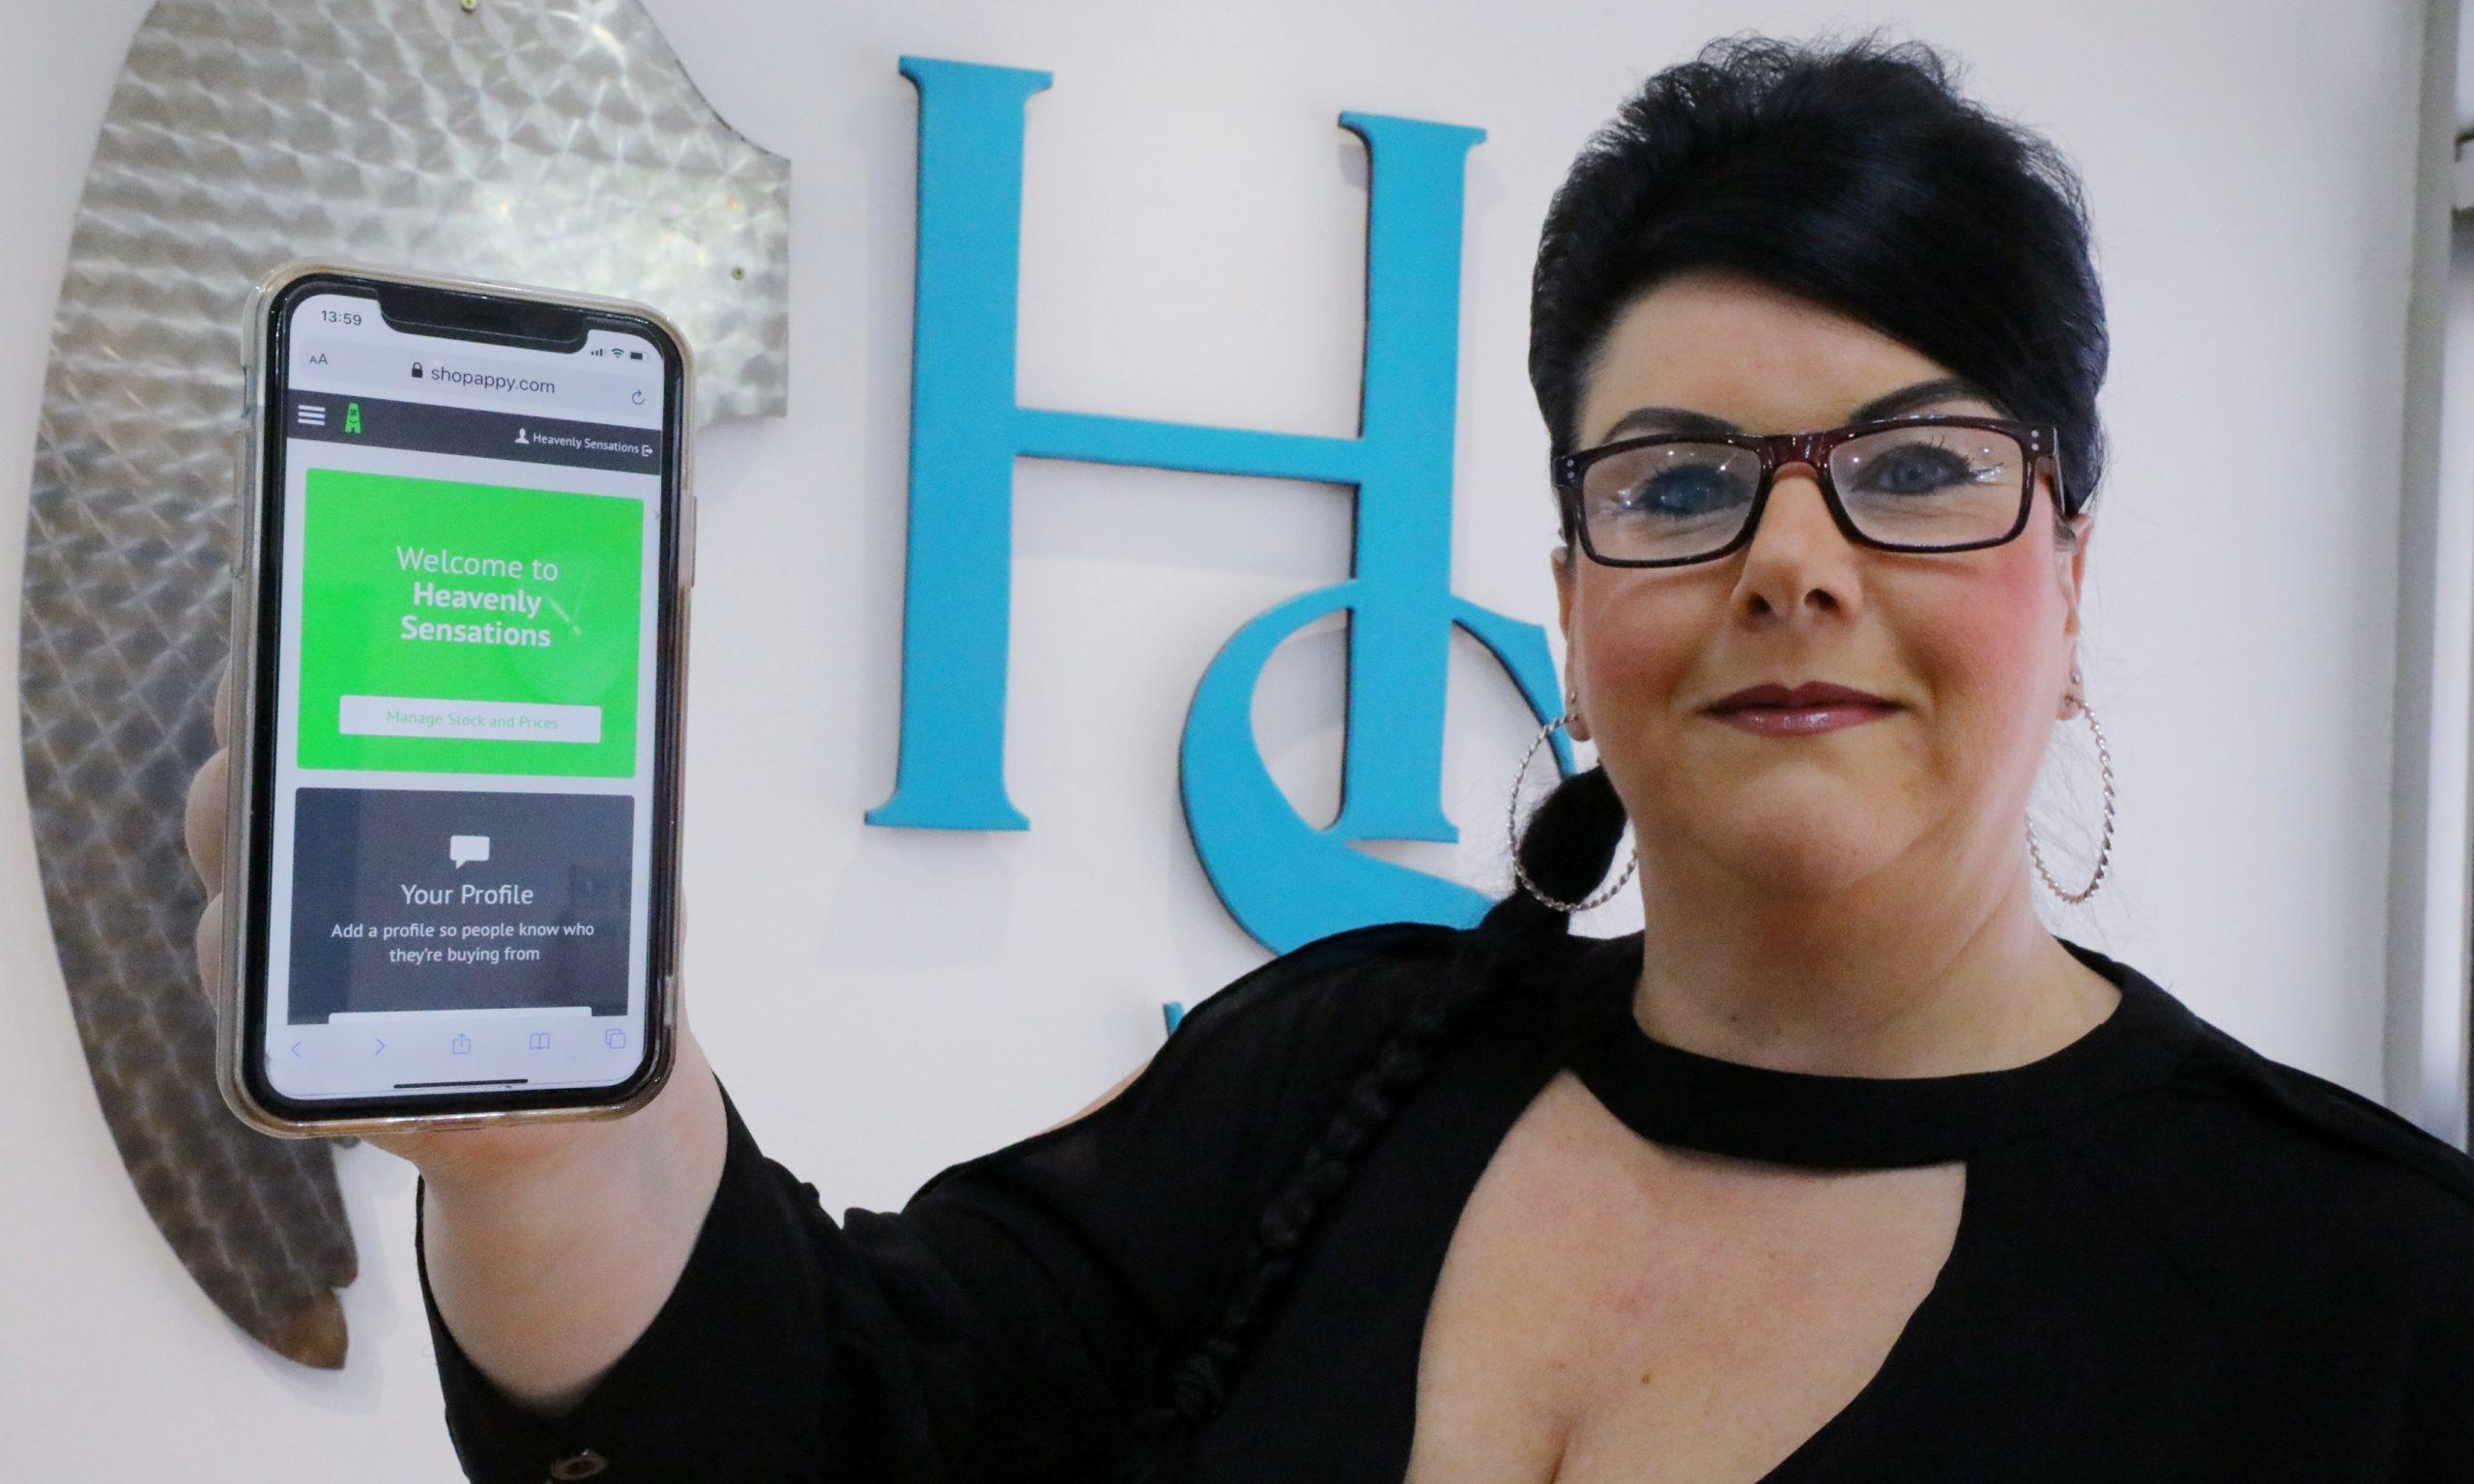 Amanda Allan from Heavenly Sensations salon demonstrates the app.